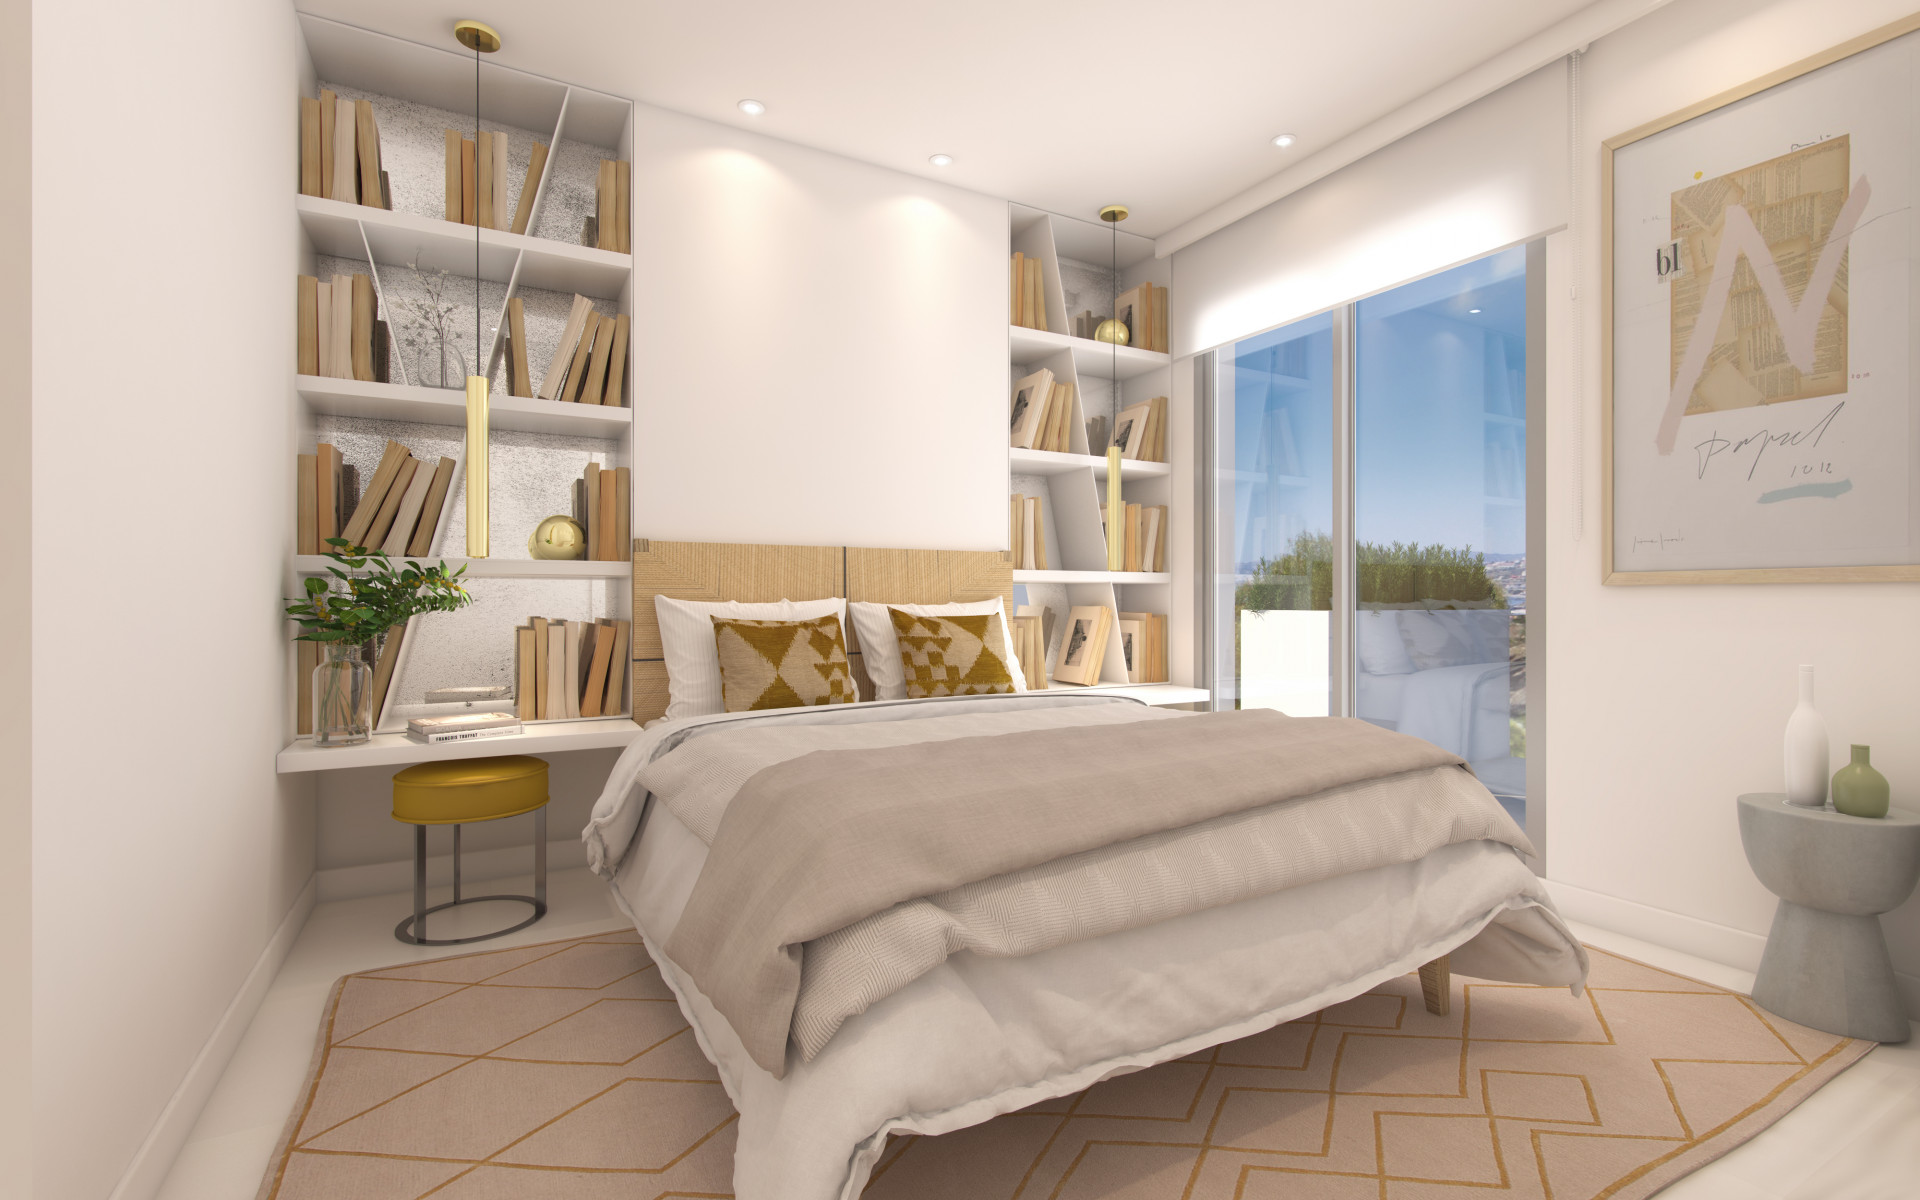 Ground Floor Apartment  for sale in  Torrequebrada, Benalmadena